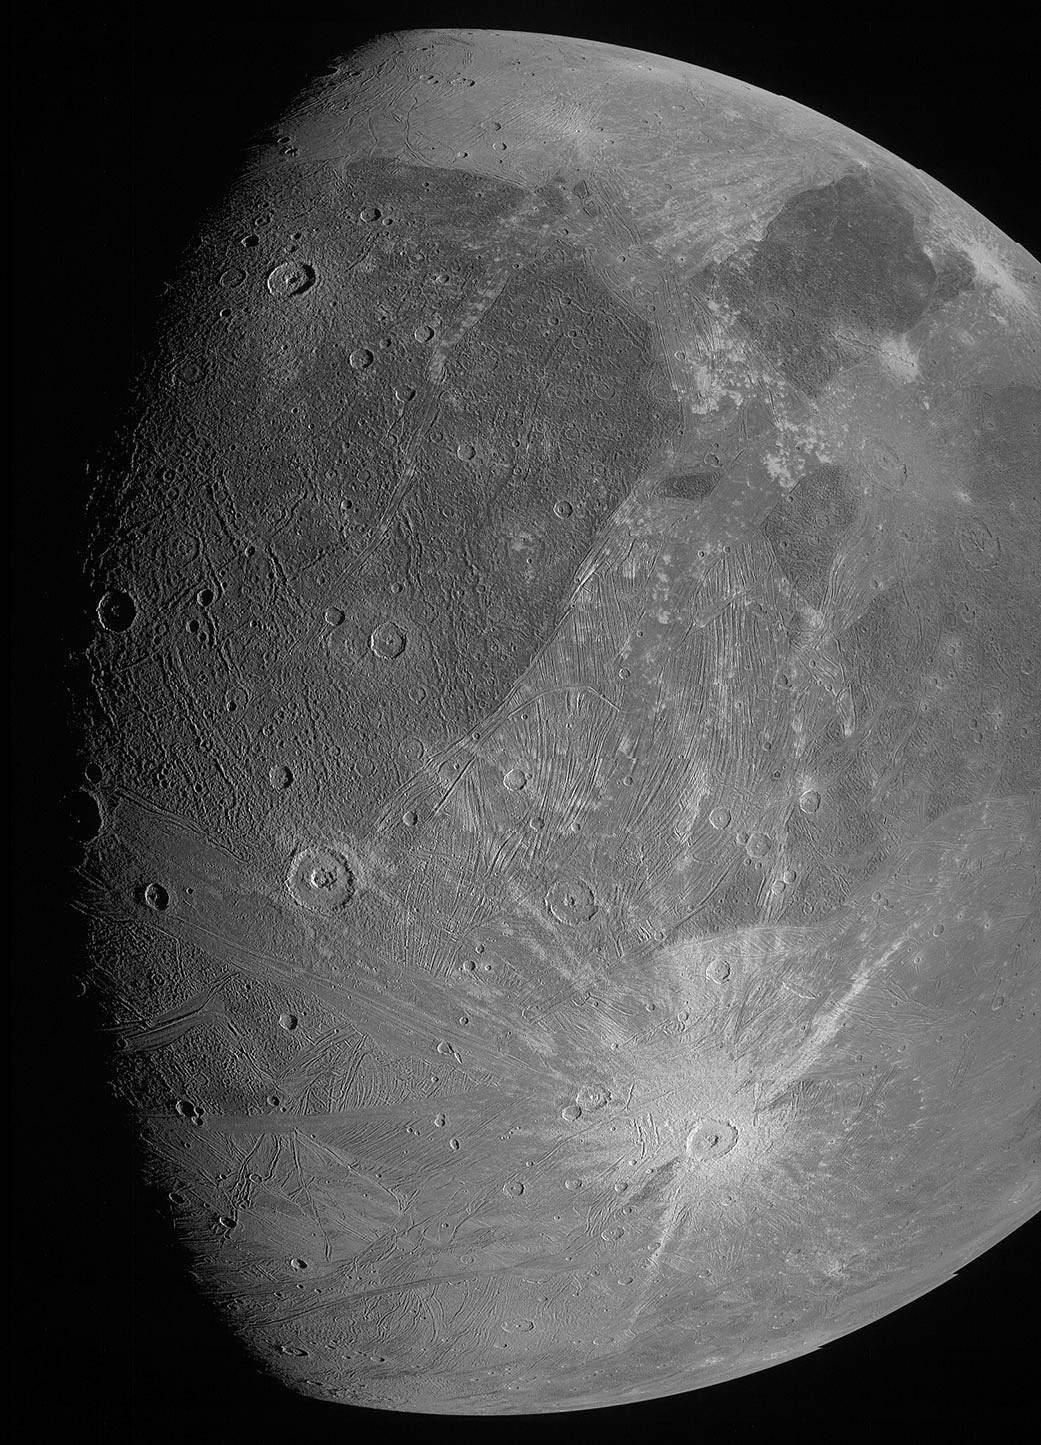 La sonde Juno prend de nouvelles images de Ganymède